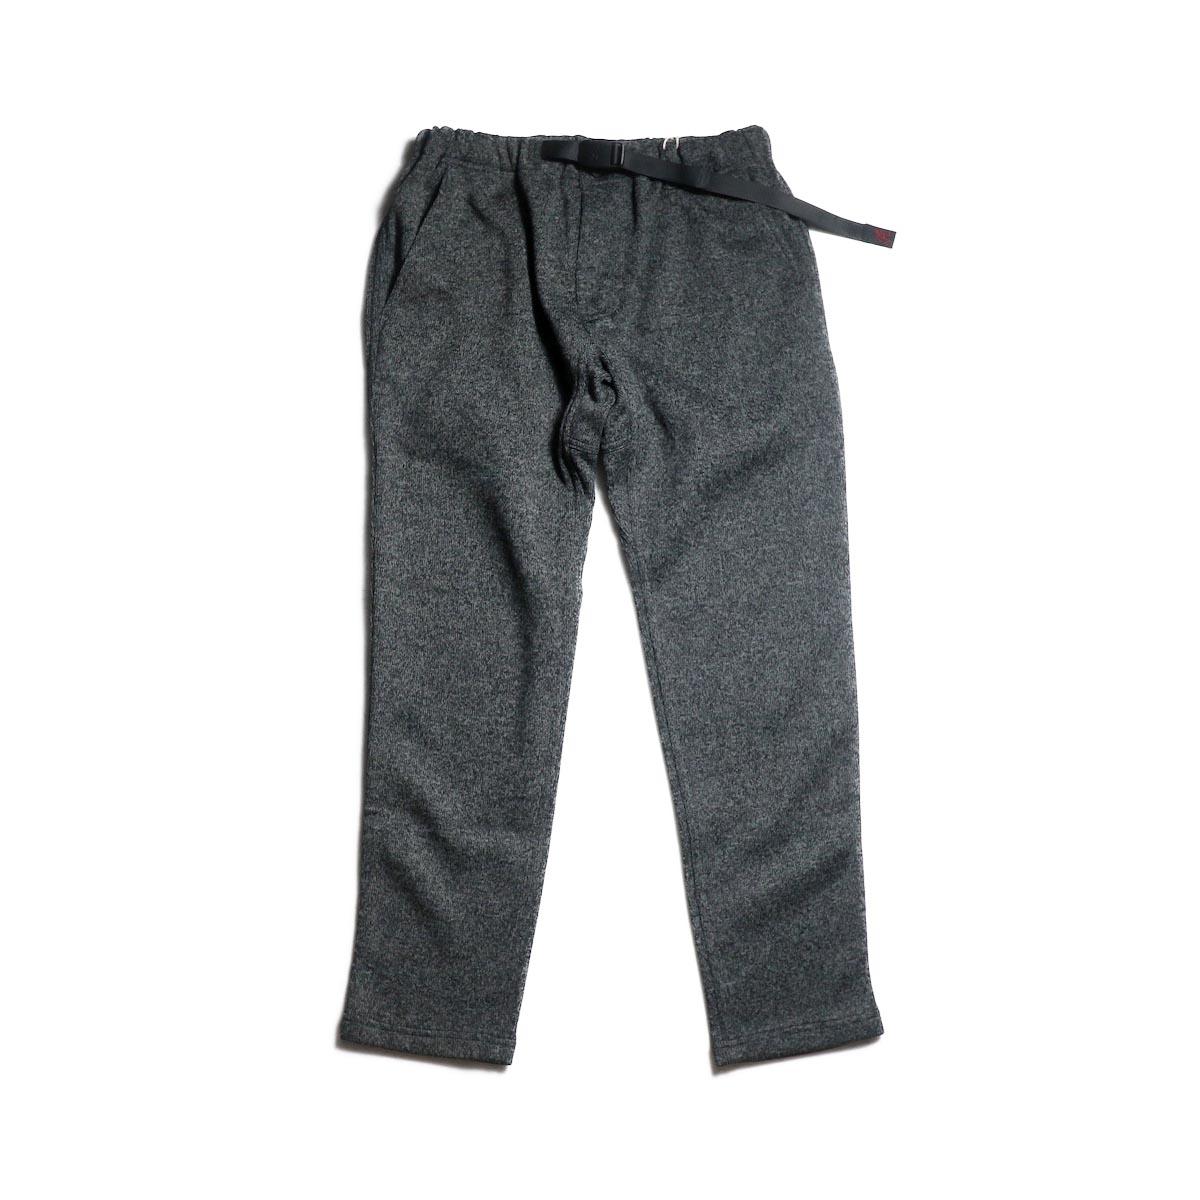 GRAMICCI / BONDING KNIT FLEECE SLIM PANTS (Charcoal × Black)